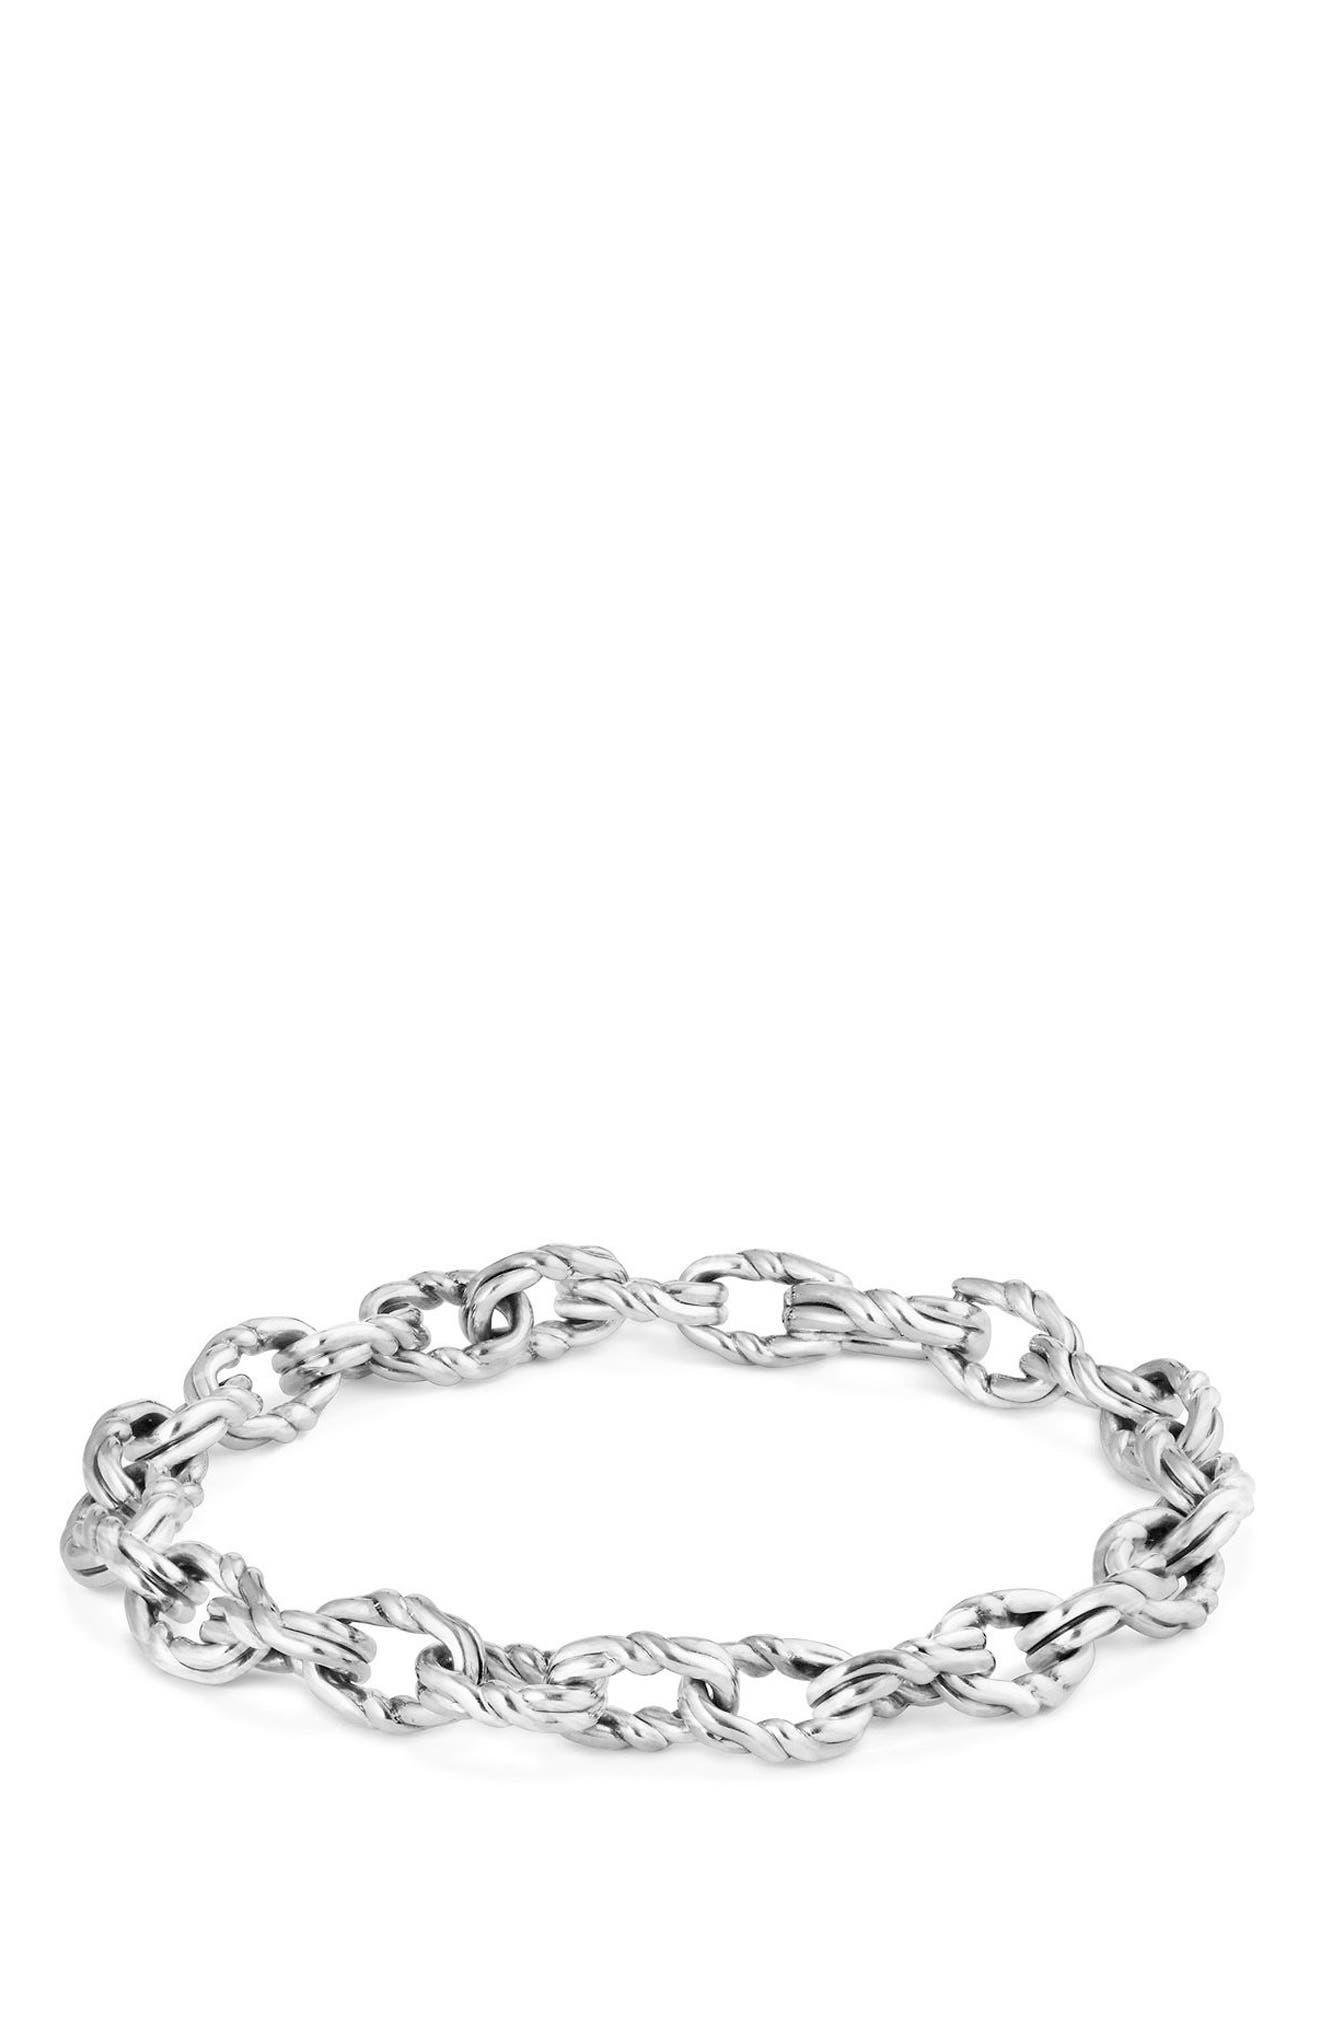 Main Image - David Yurman Continuance Chain Bracelet